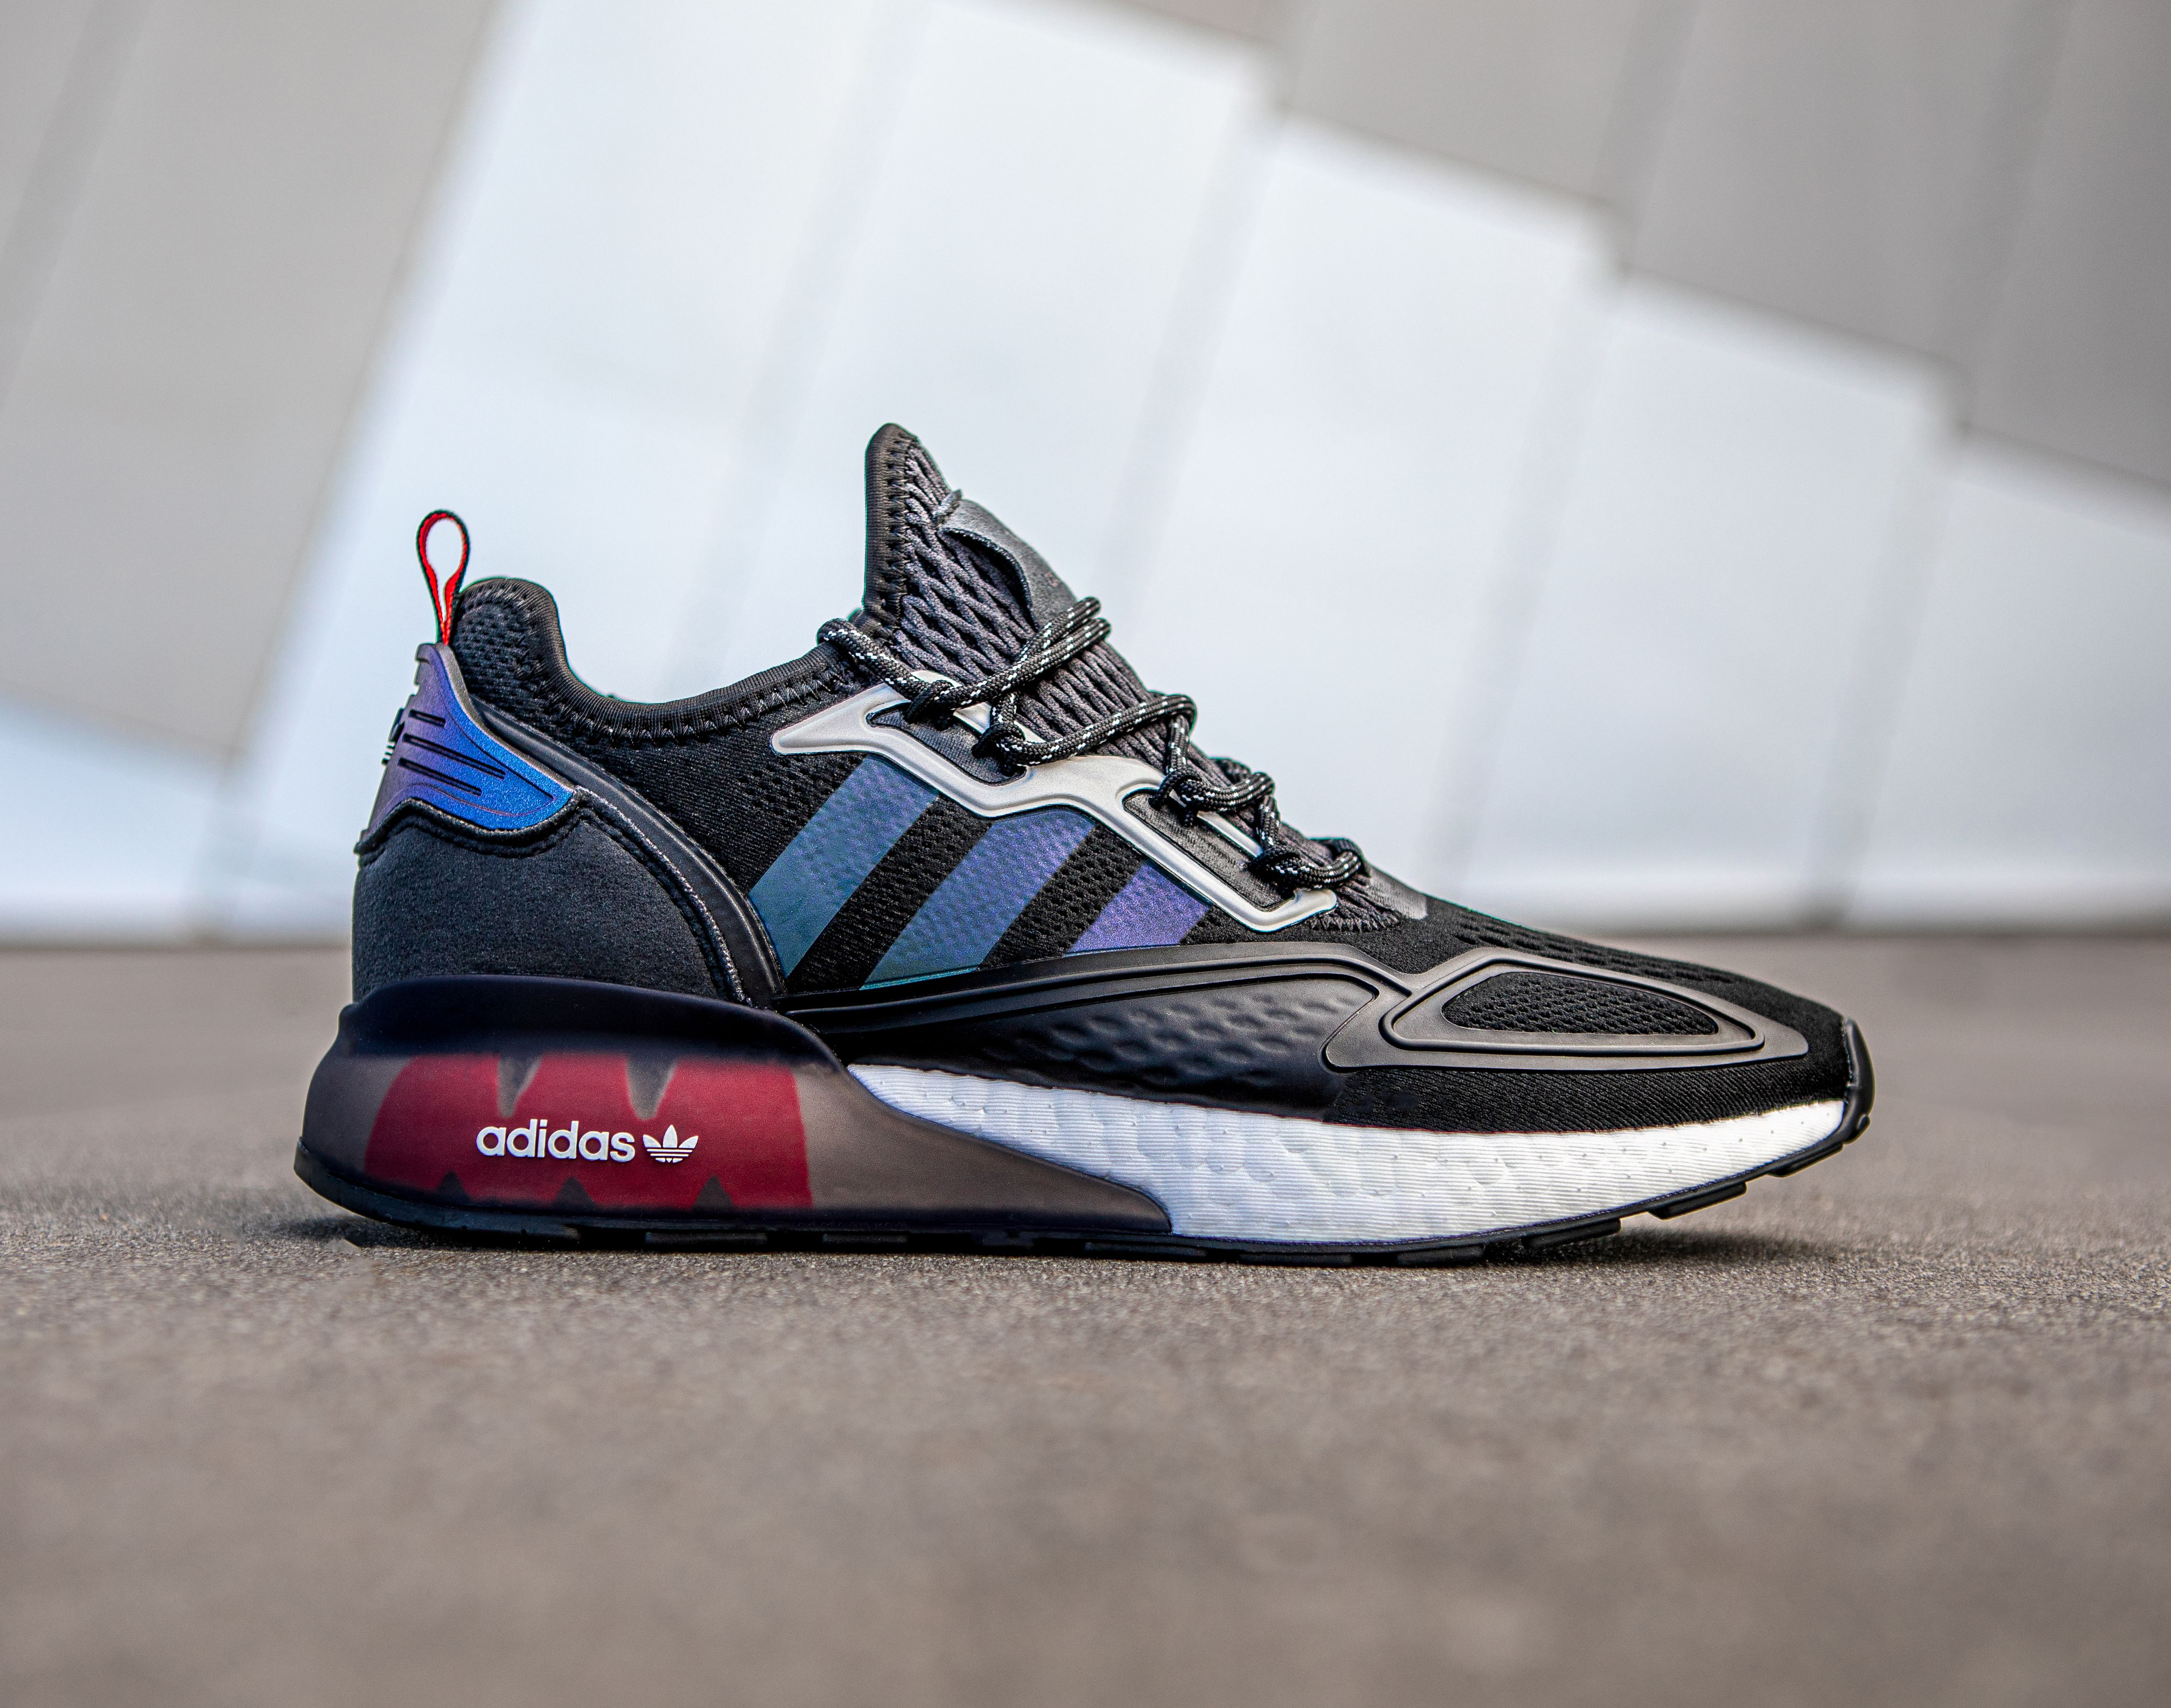 adidas ZX 2K BOOST (Black/Solar Red)